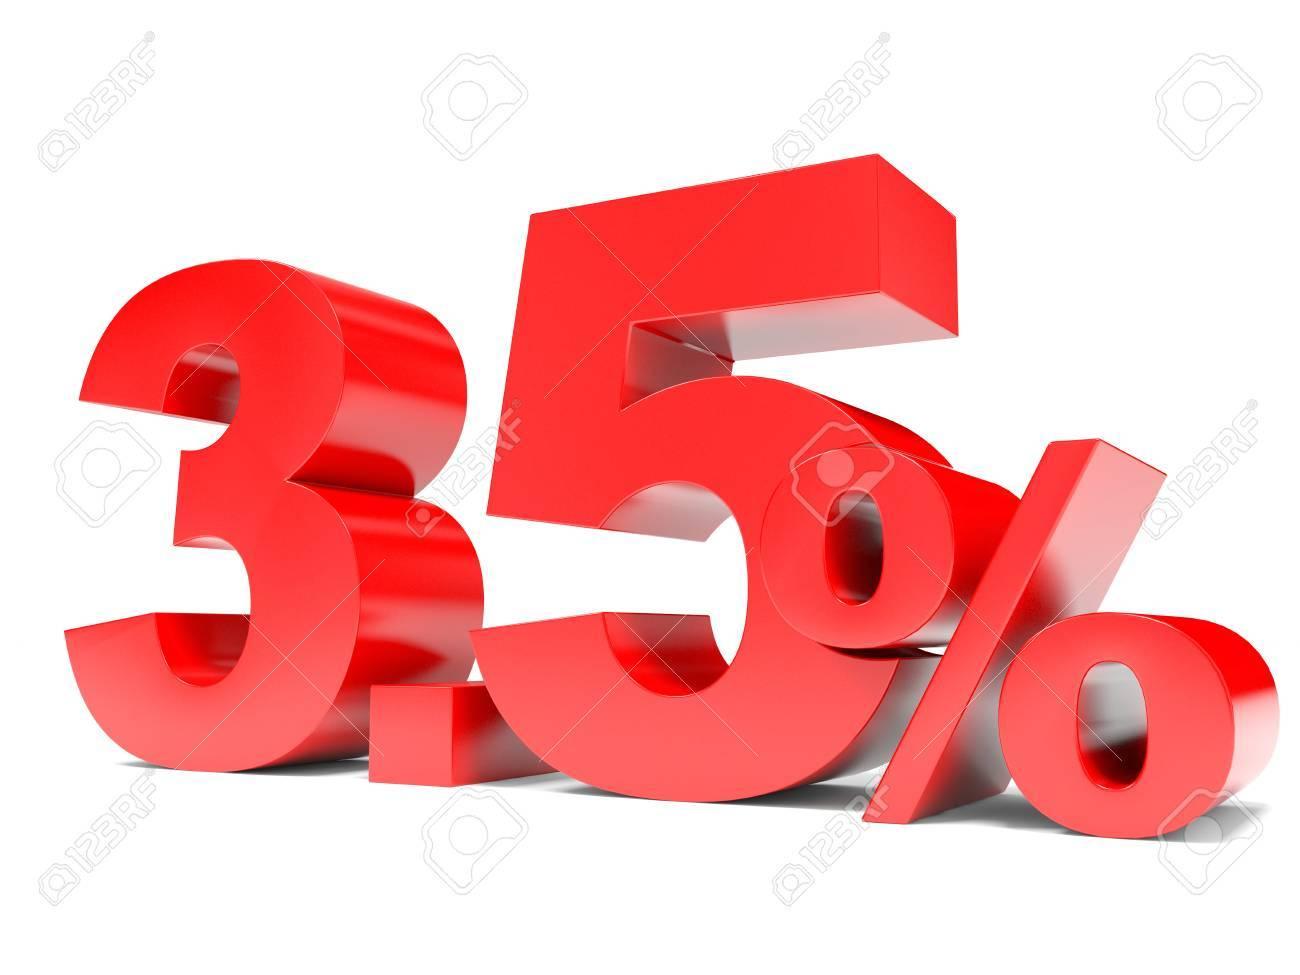 3.5 Discount